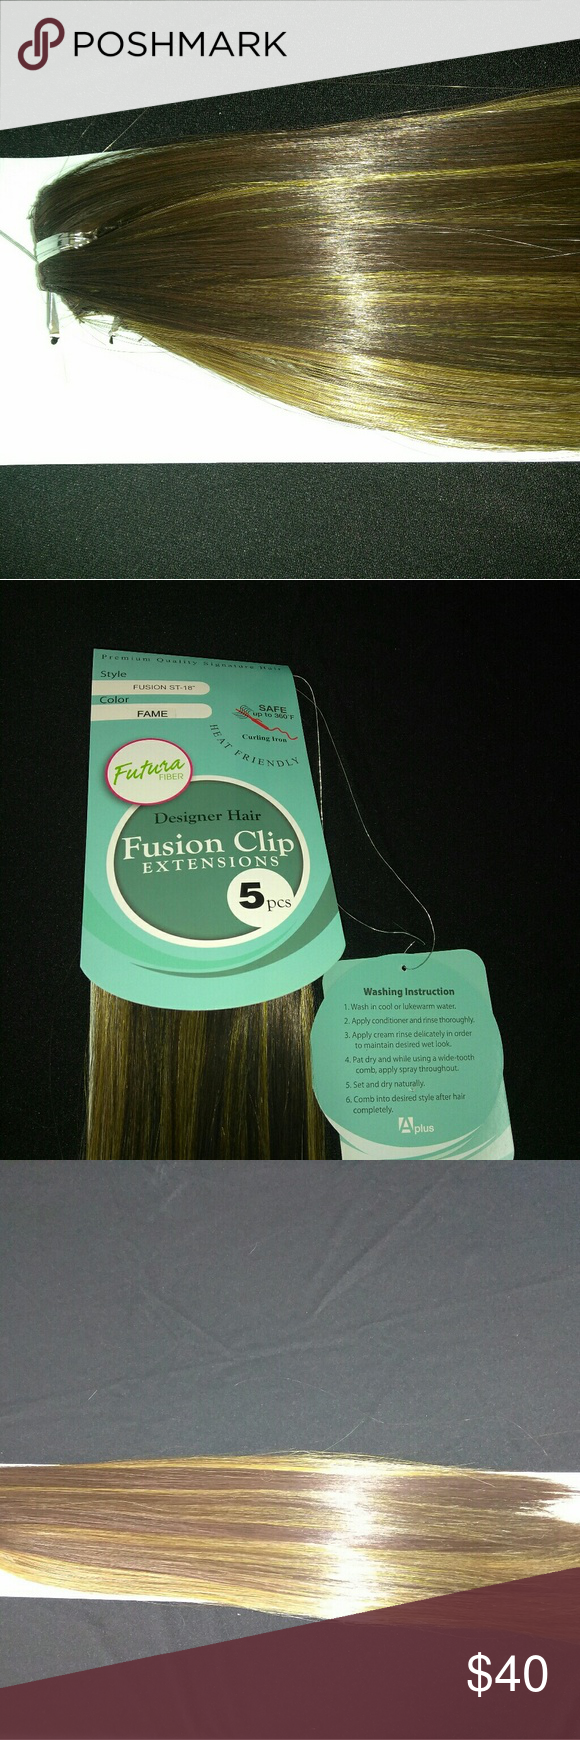 114 Fusion Clip 5pcs Hair Extension Hair Extensions Extensions